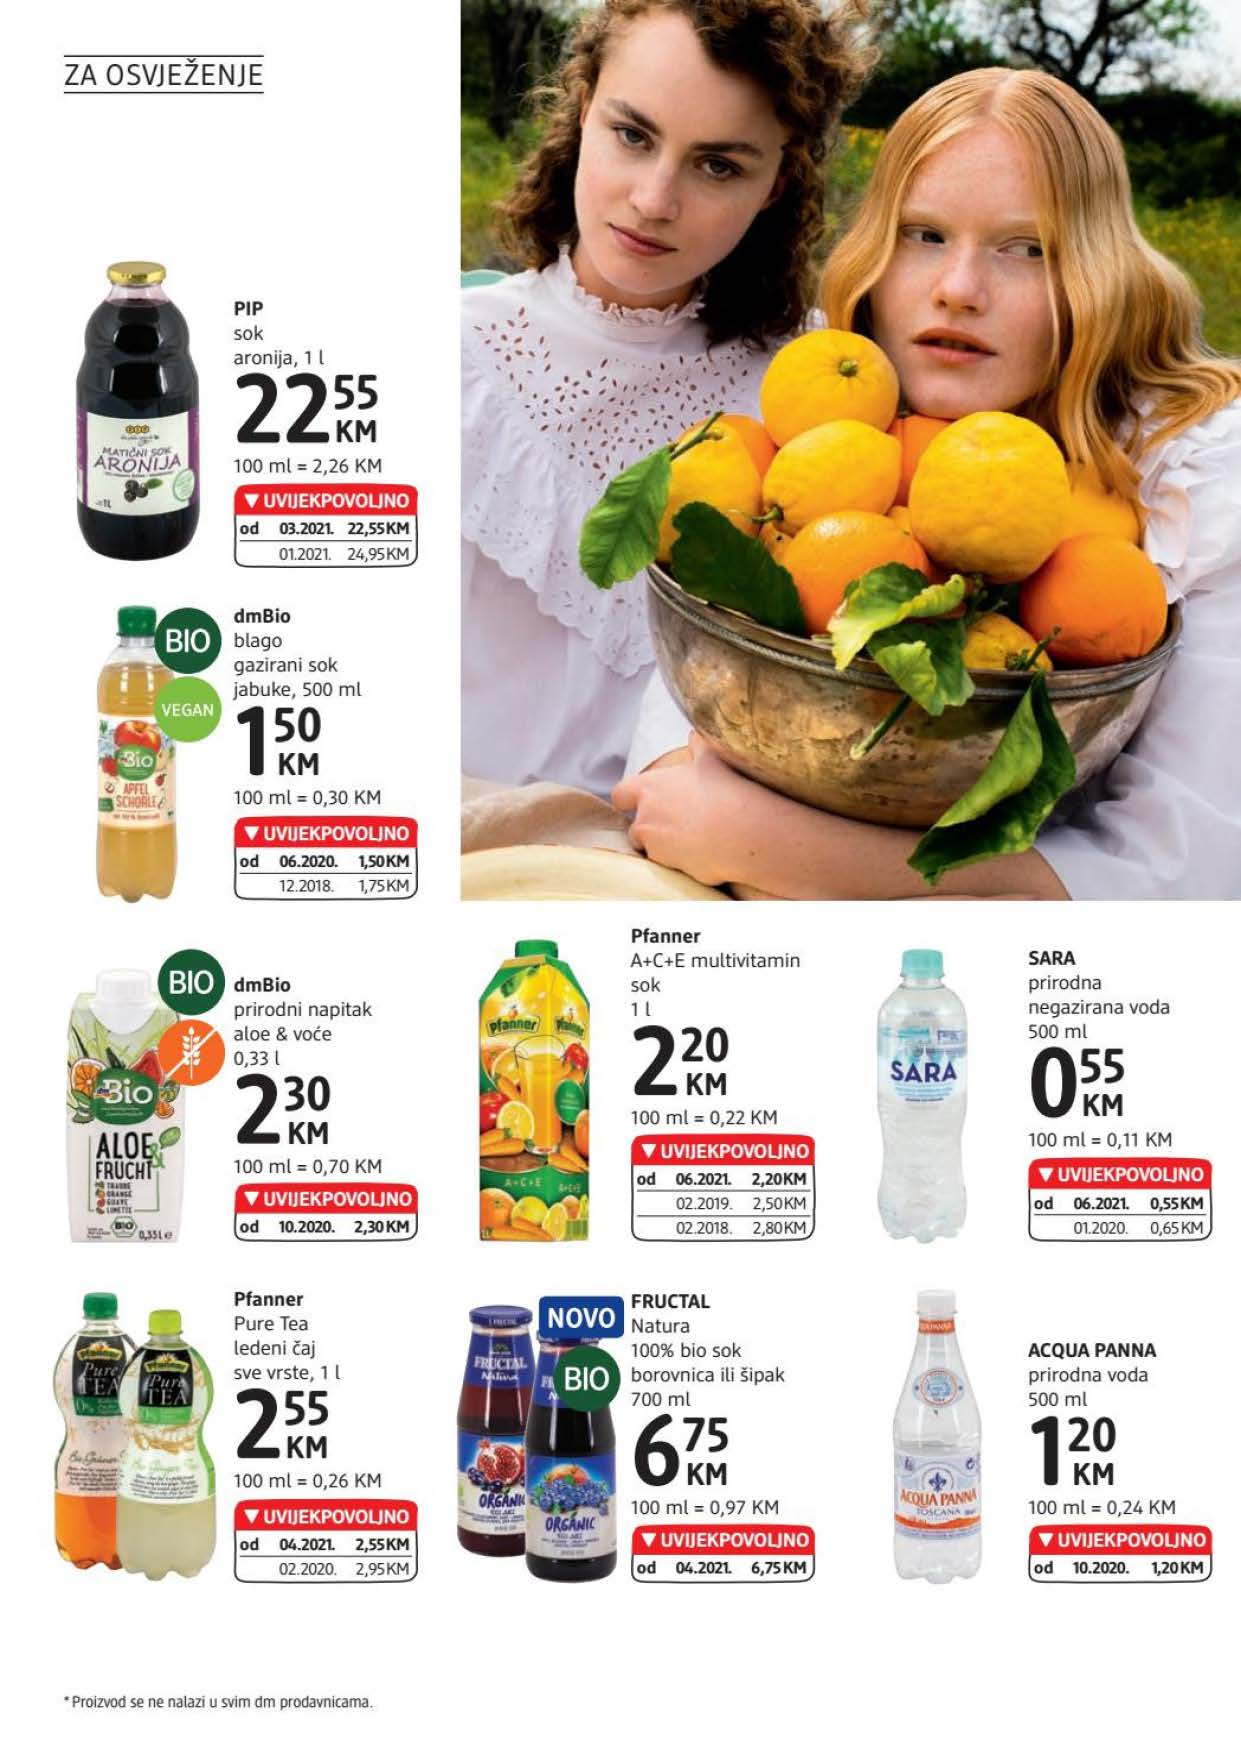 DM Katalog BiH JUN JUL 2021 23.6.2021. 6.7.2021. eKatalozi.com PR Page 18